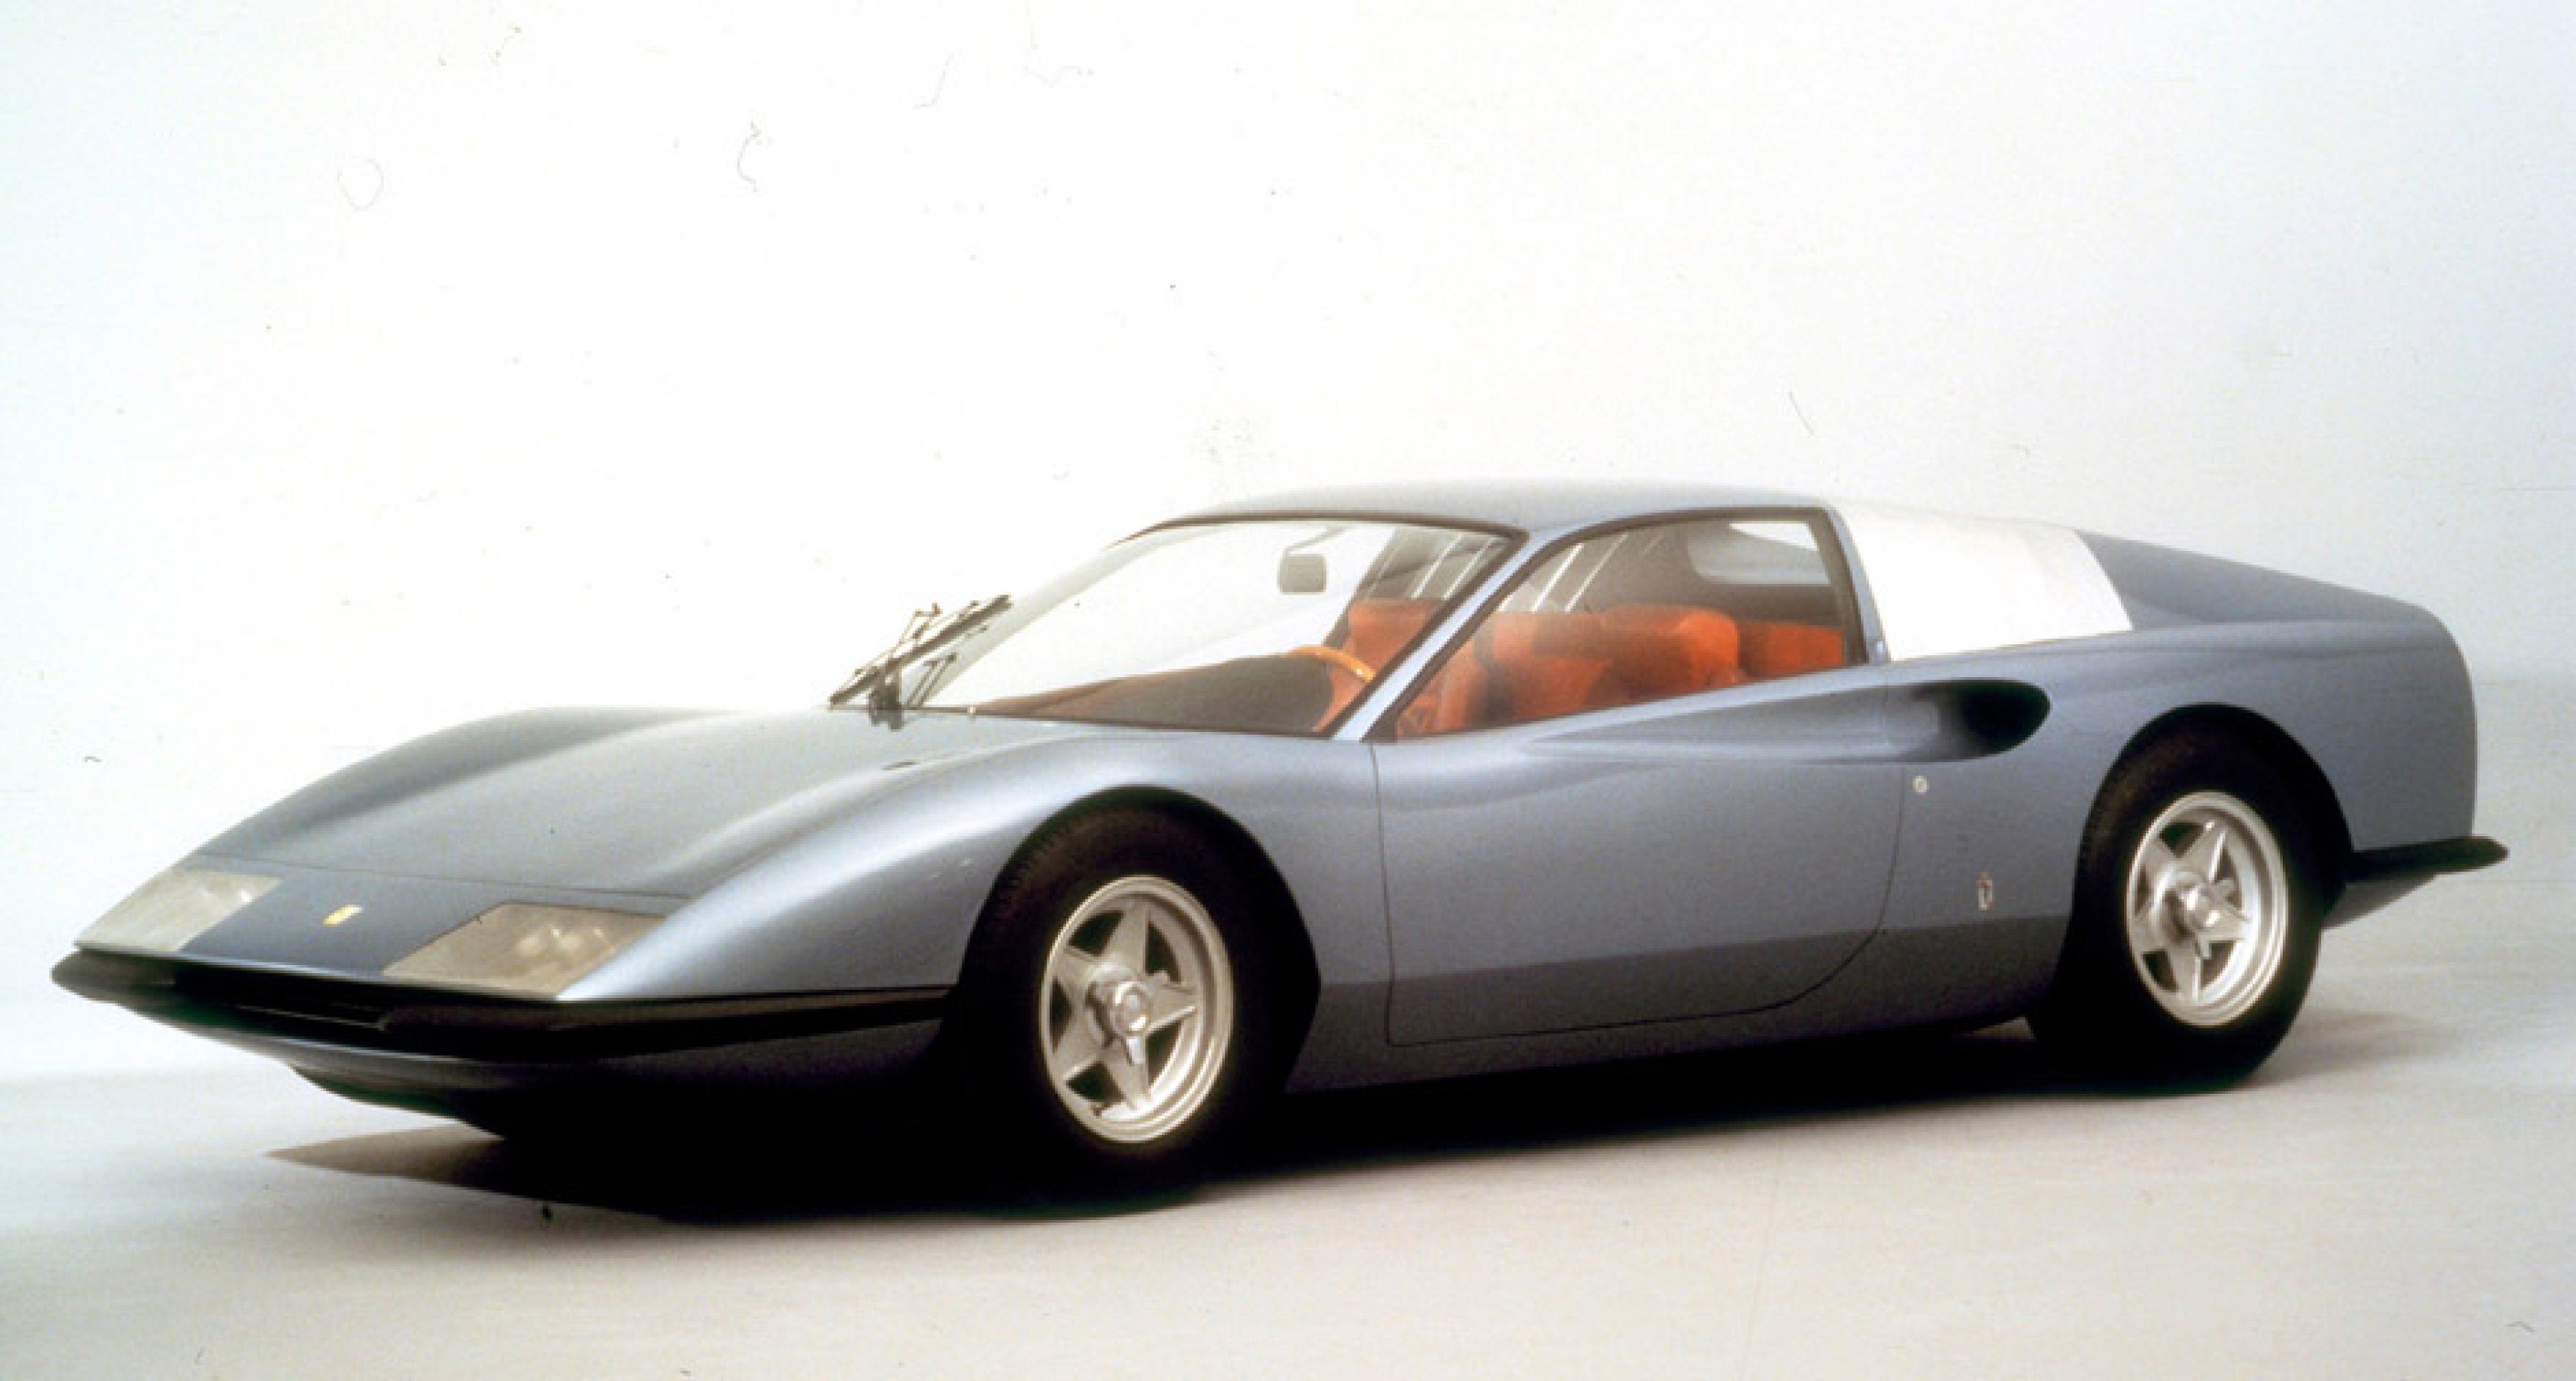 ajab-jankari-omg-facts-amazing-cars-in-world